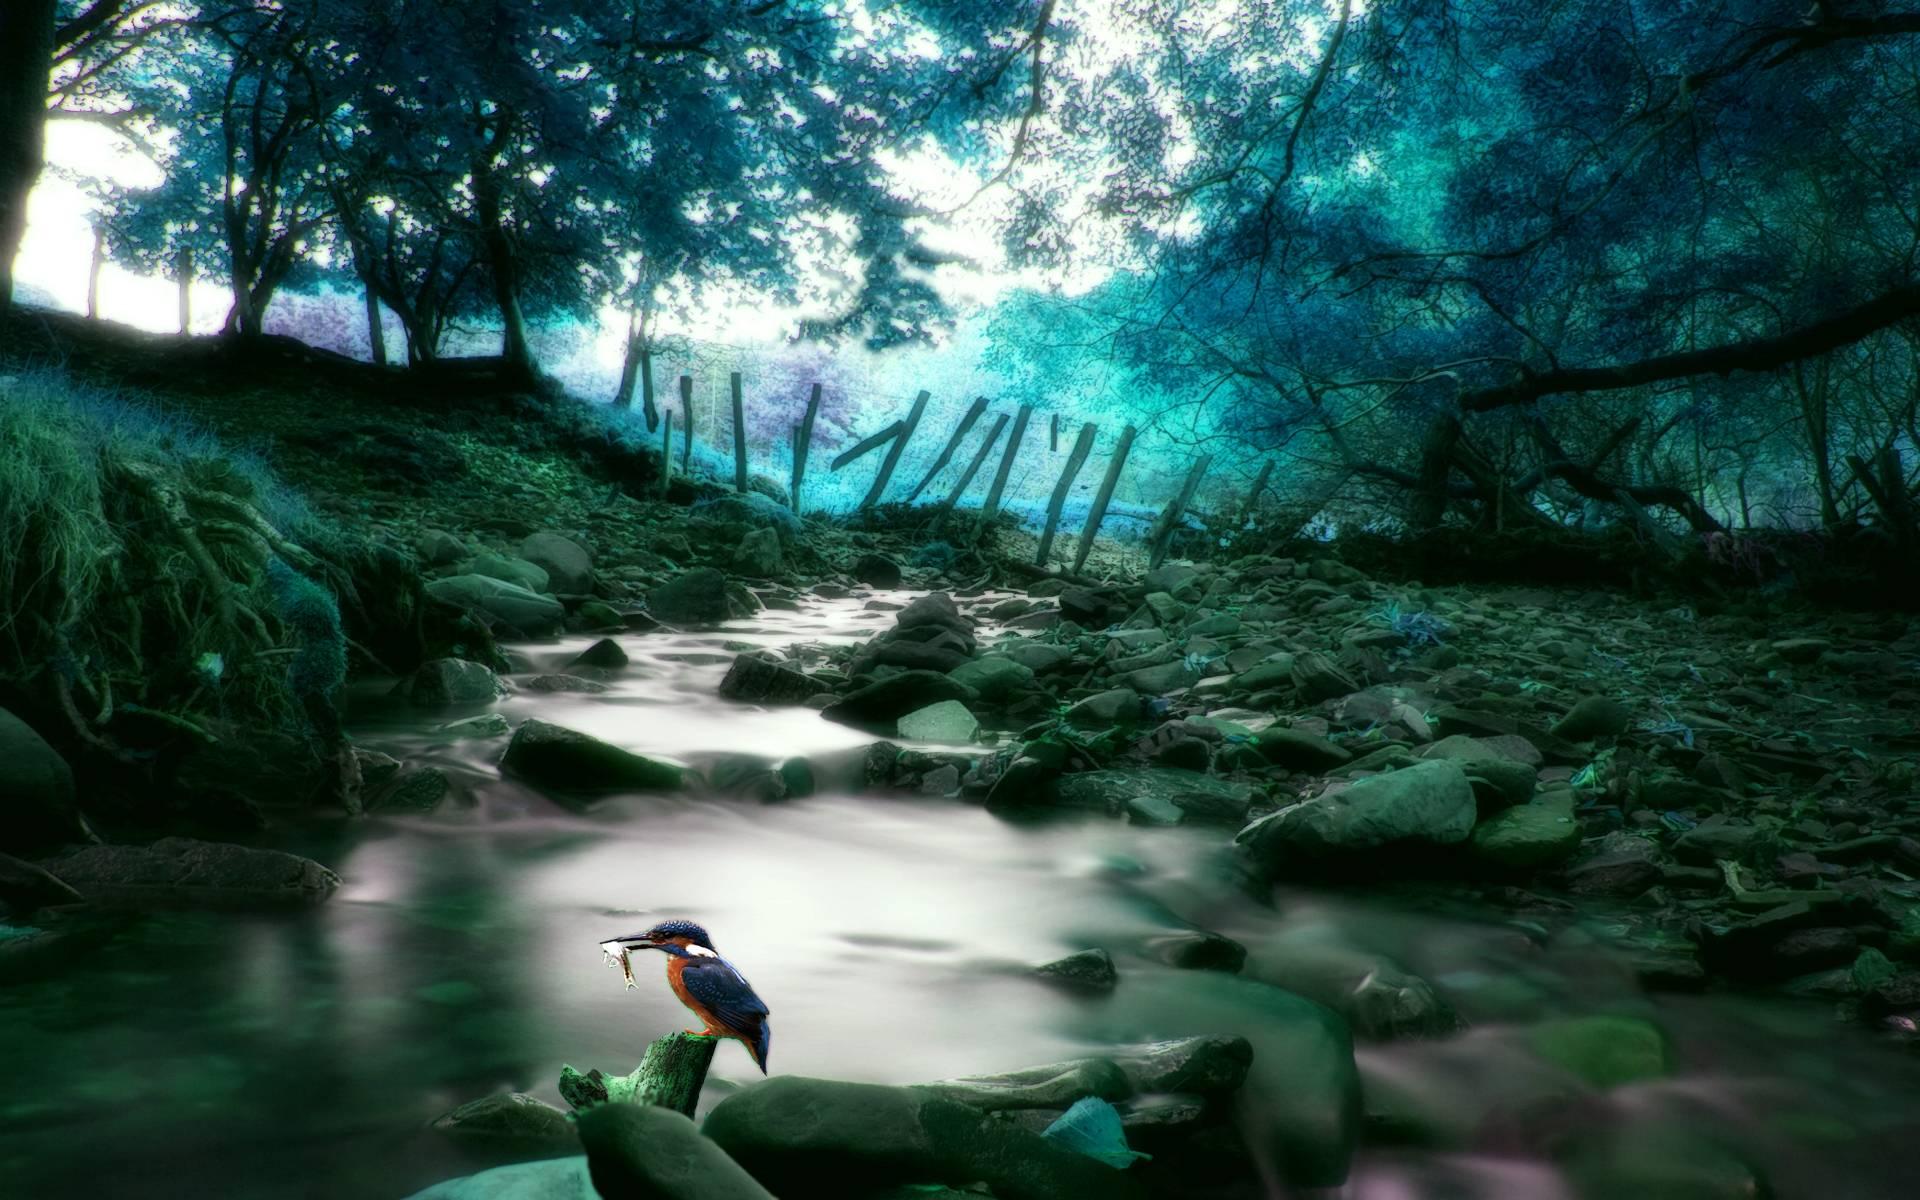 Kingfisher Background 38975 2560x1600 px